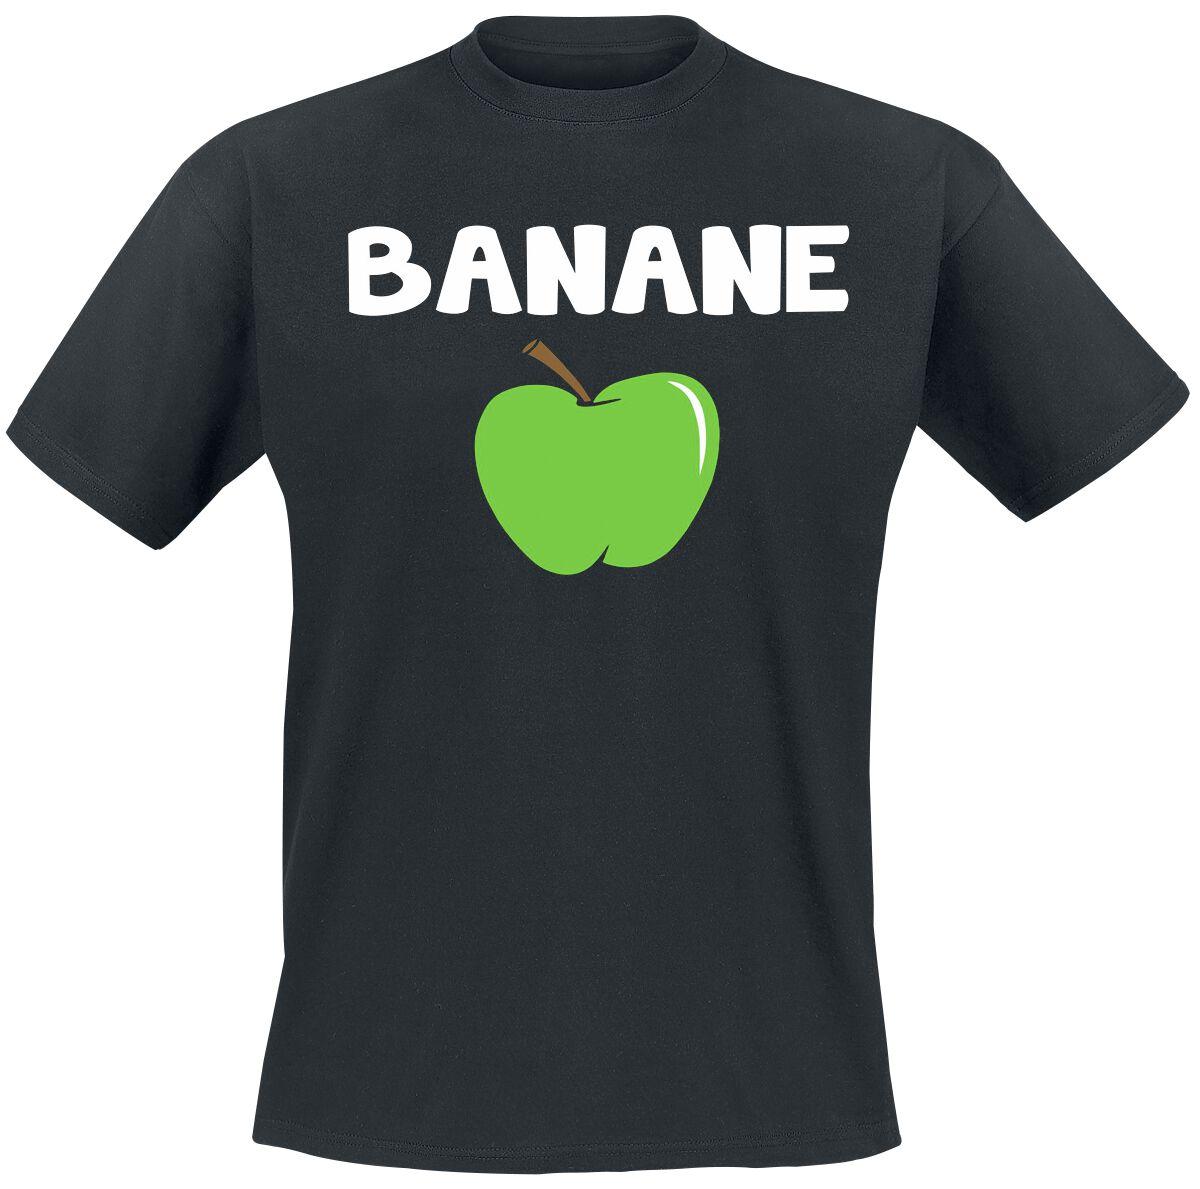 Banane T-Shirt schwarz POD BY083, black Banane